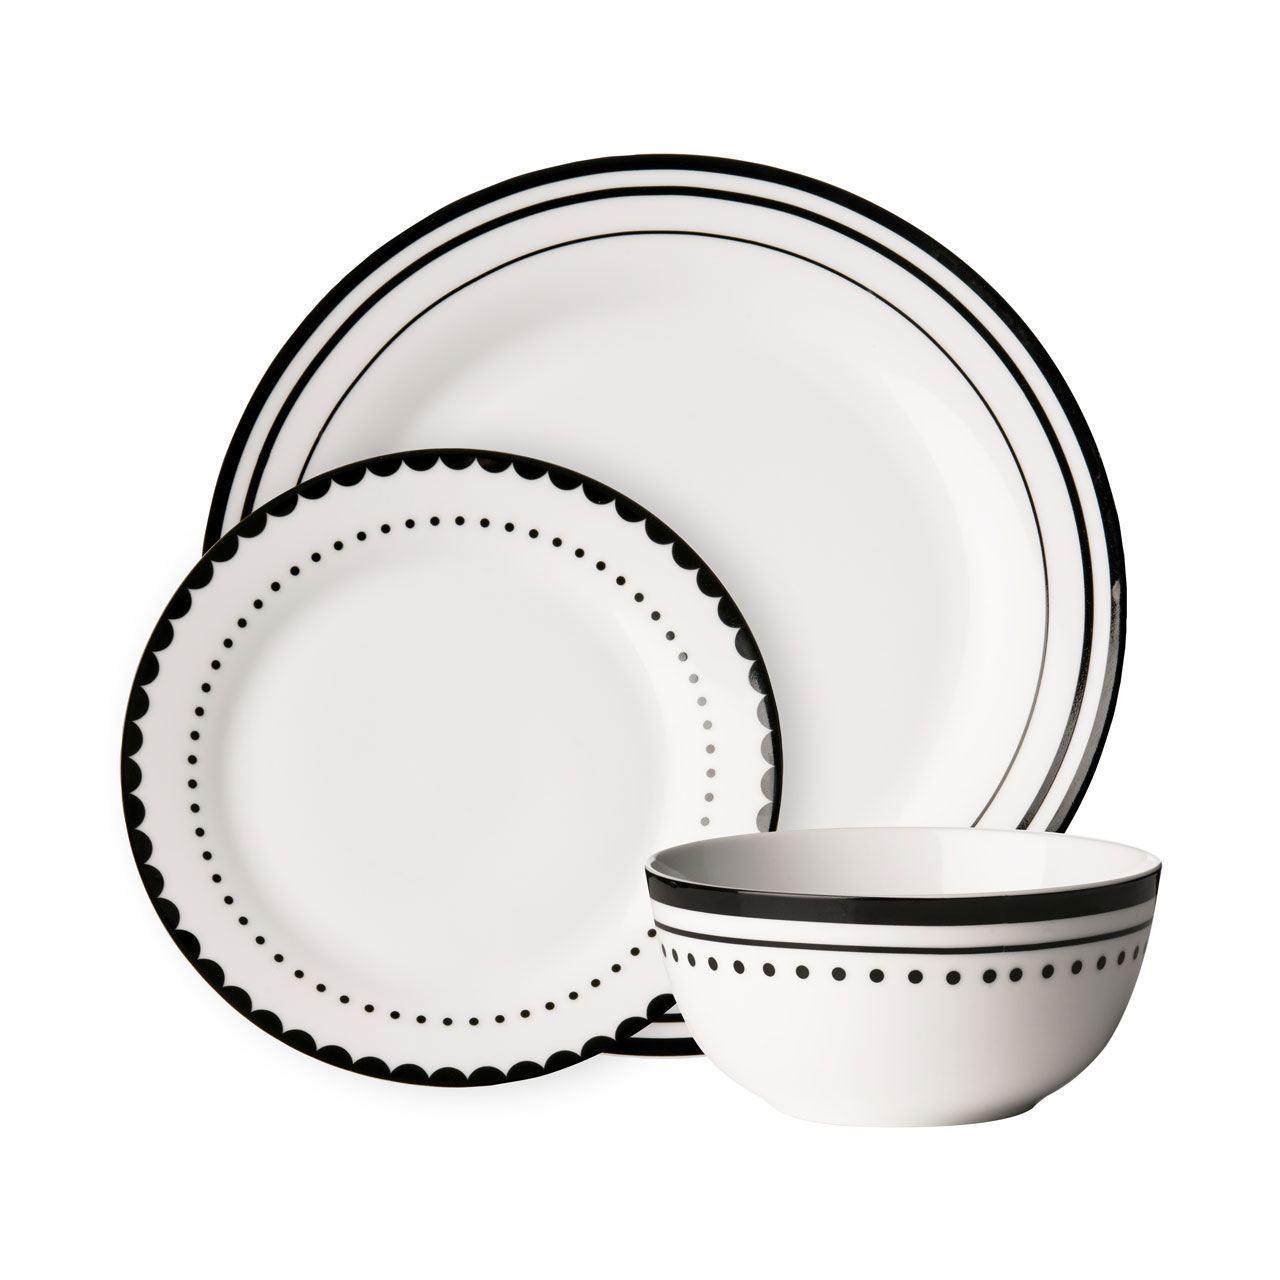 12pc-Dinner-Set-Porcelain-Dining-Tableware-Set-Various-  sc 1 st  eBay & 12pc Dinner Set - Porcelain Dining Tableware Set (Various Designs ...